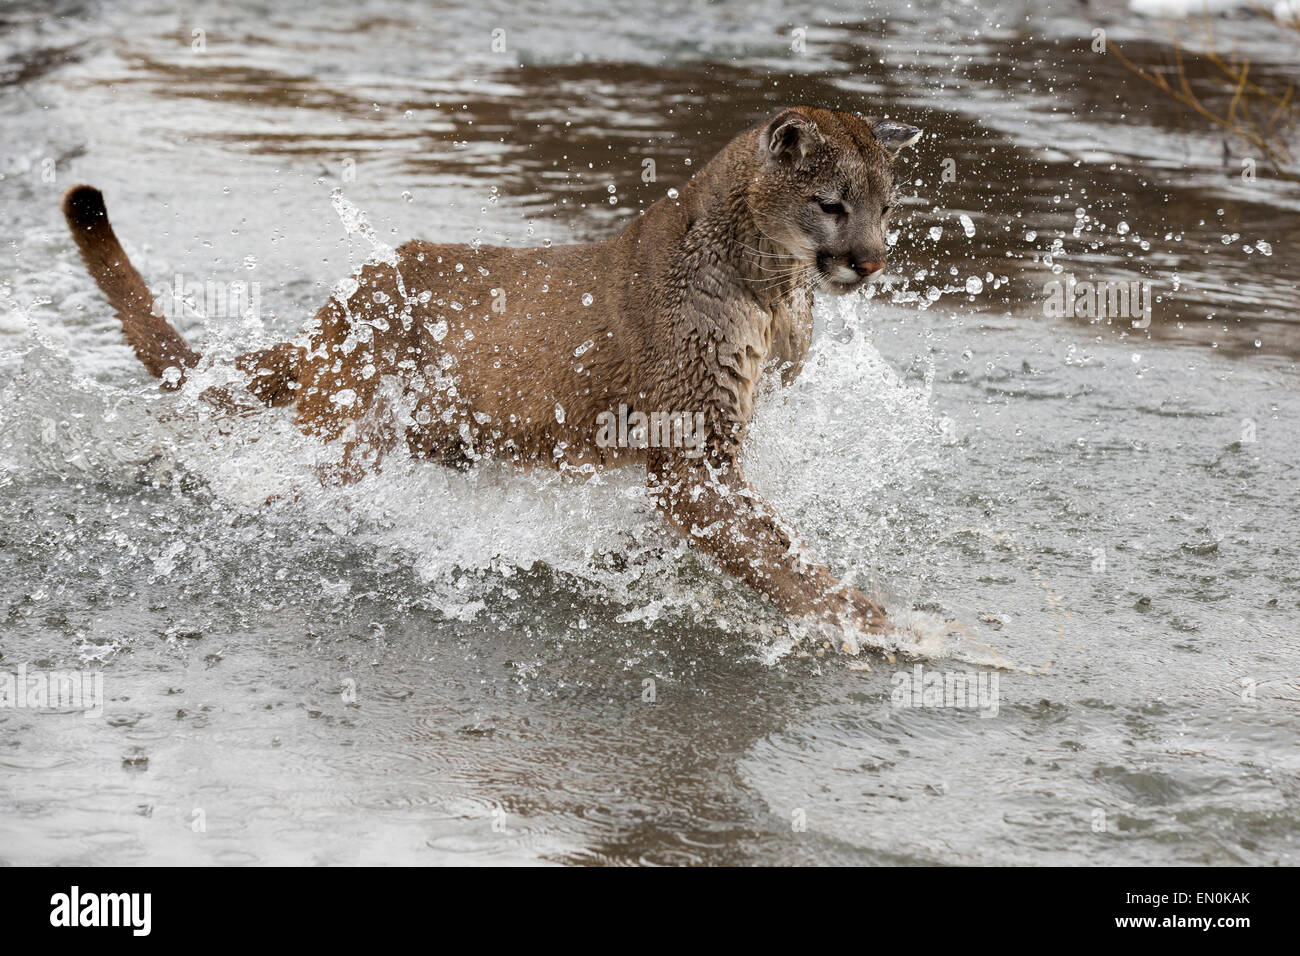 Mountain Lion (Felis concolor) running through a river in Winter - Stock Image